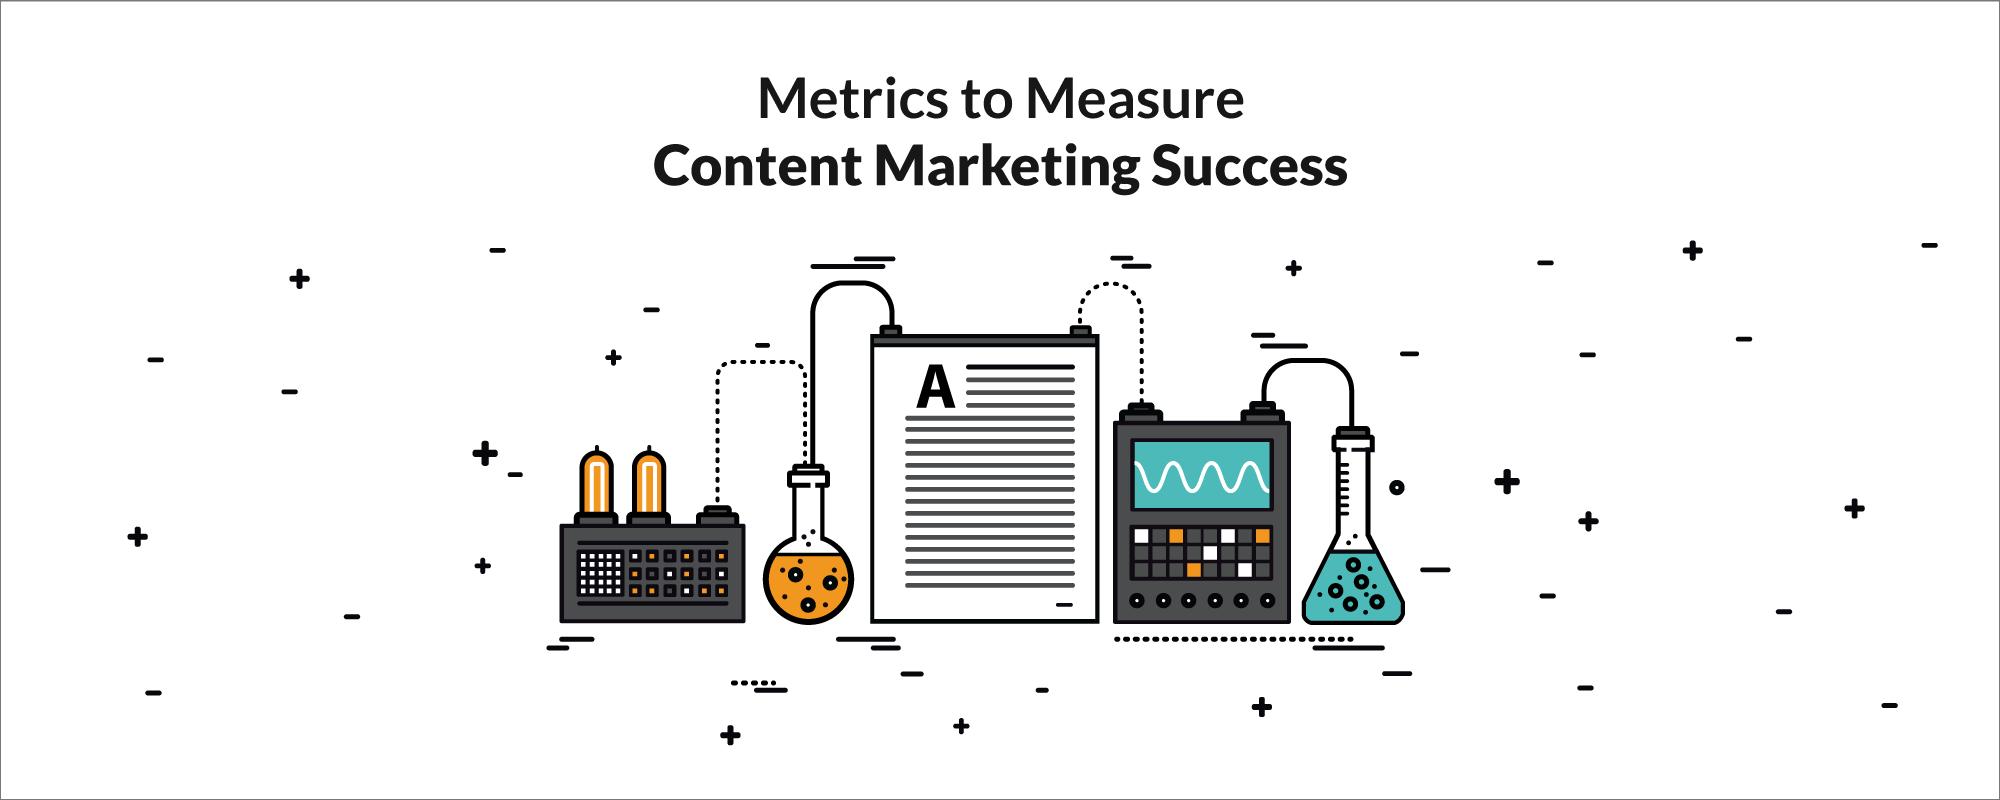 Various Metrics to Measure Content Marketing Success